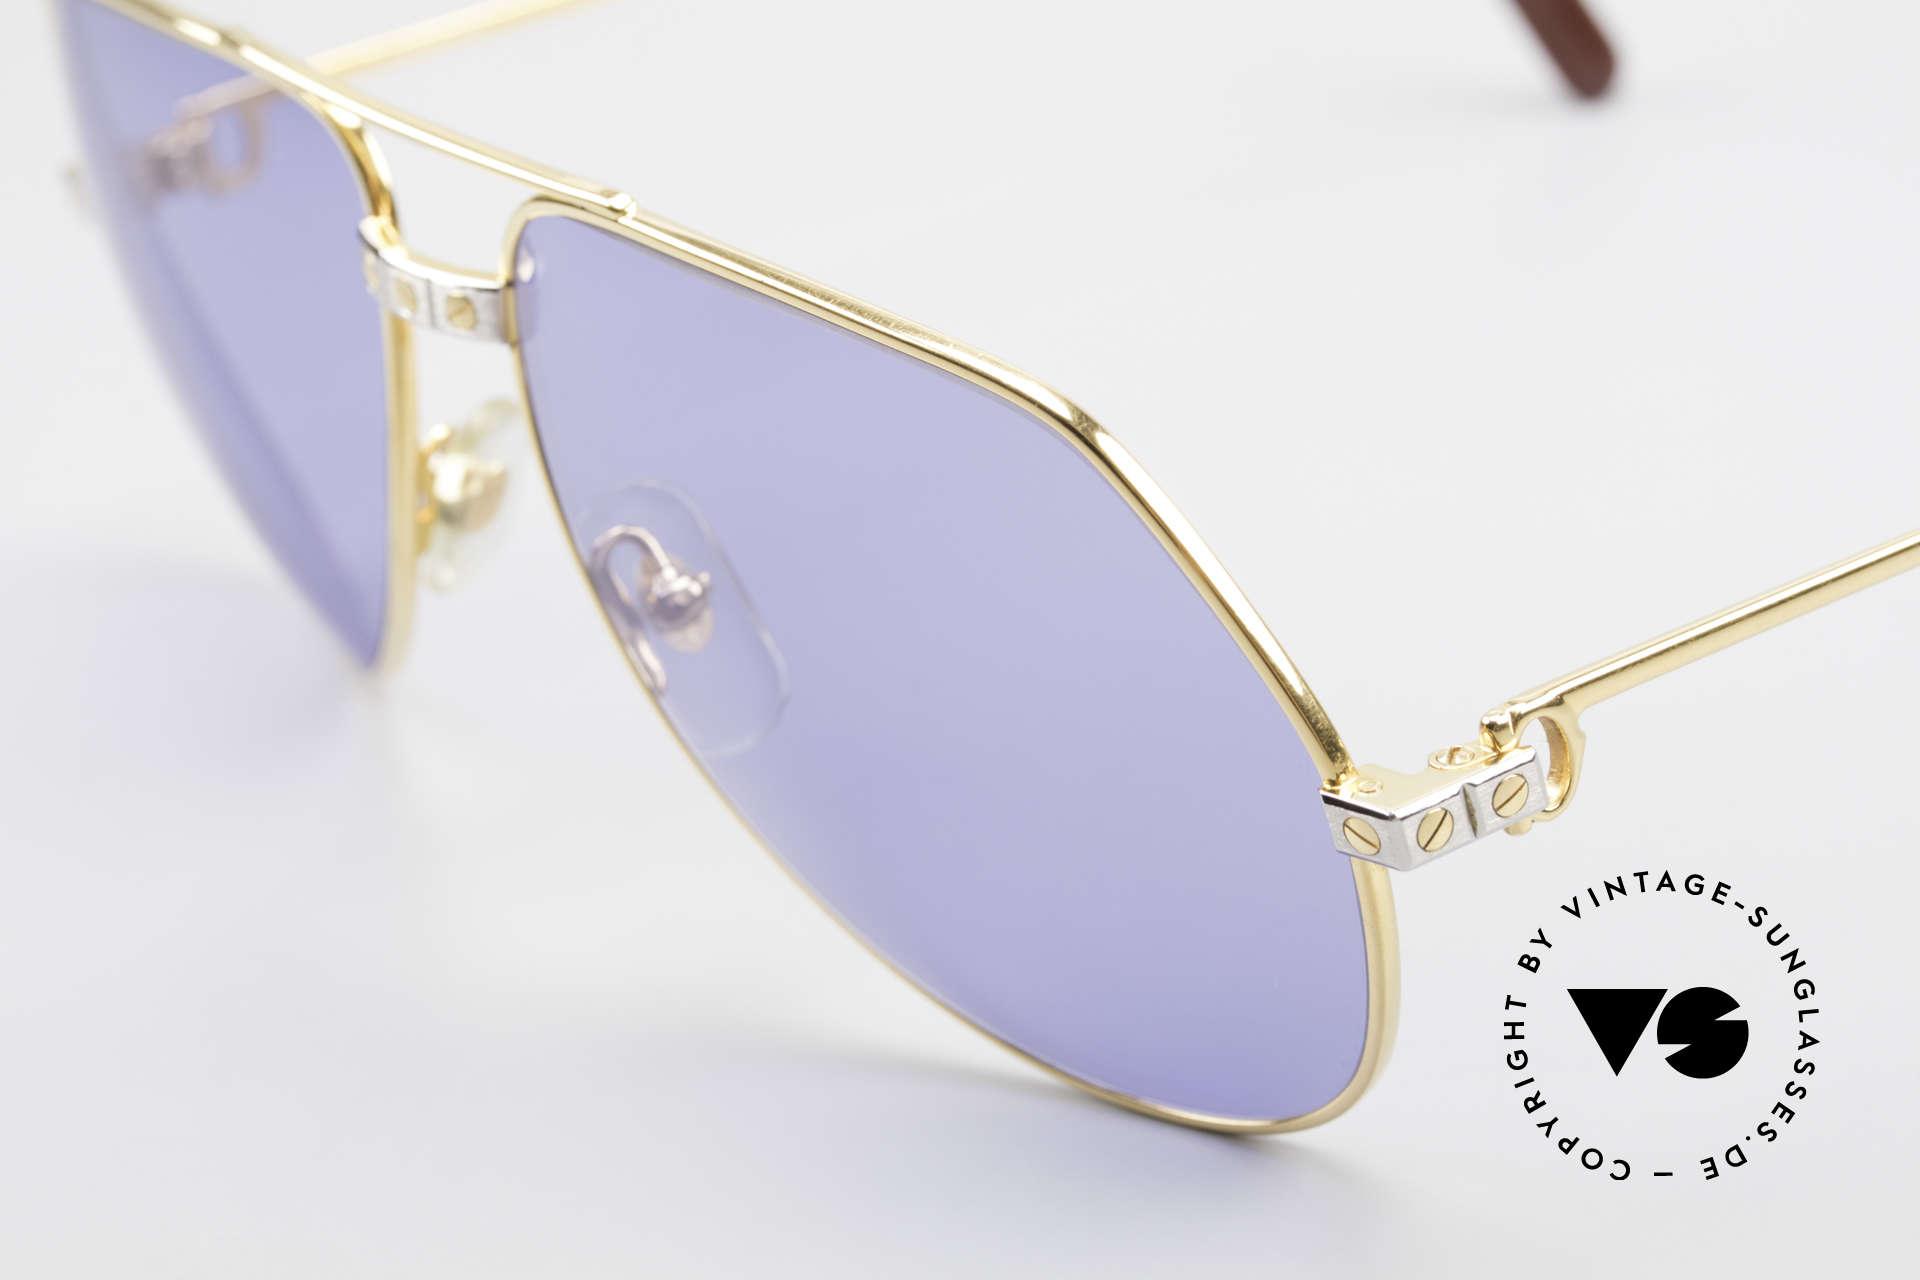 Cartier Vendome Santos - L 80's Luxury Aviator Sunglasses, worn by actor Christopher Walken (JAMES BOND, 1985), Made for Men